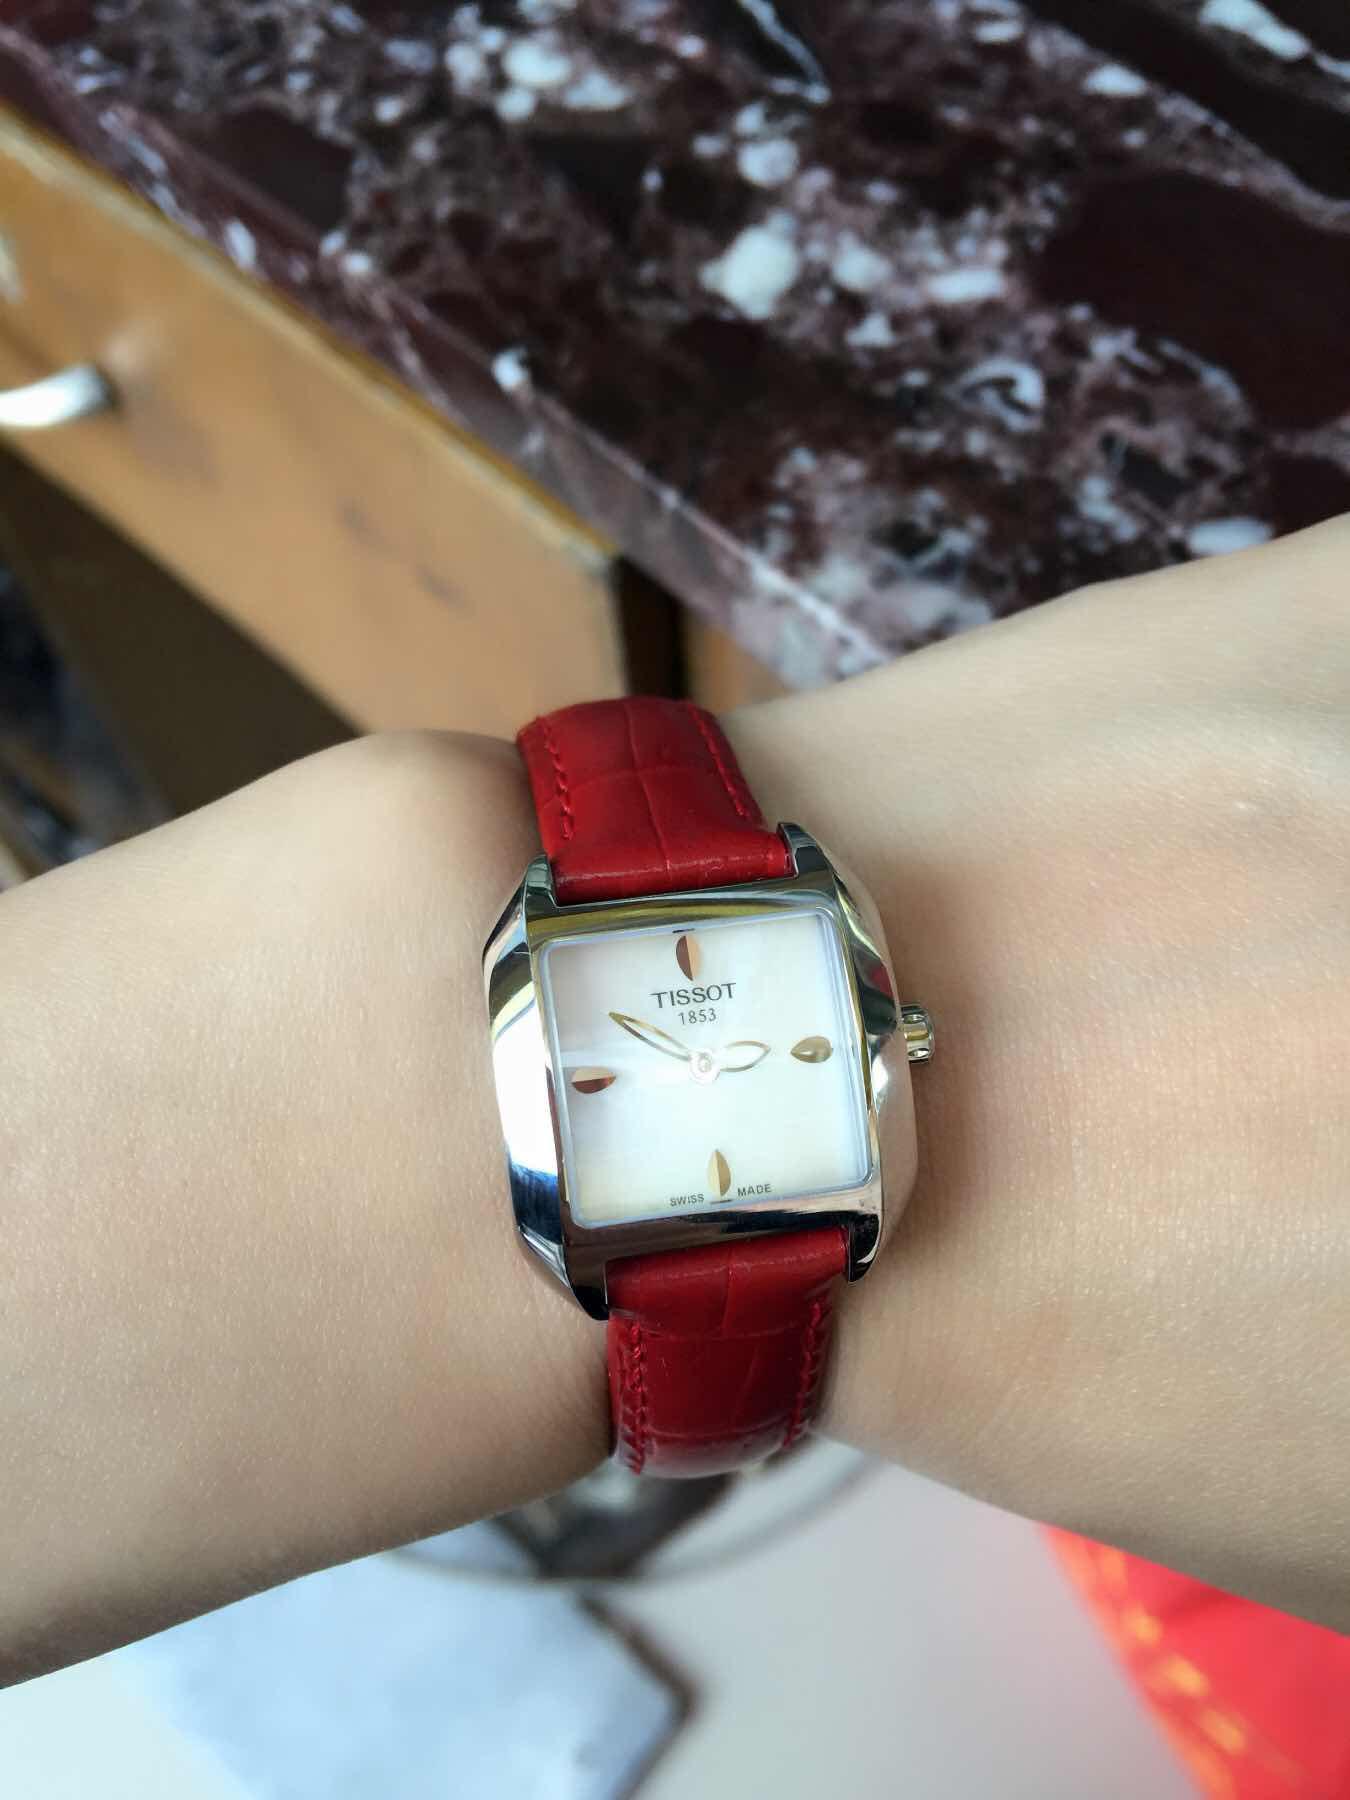 danielle stevens jewelry celebrities 00294686 cheapestonline